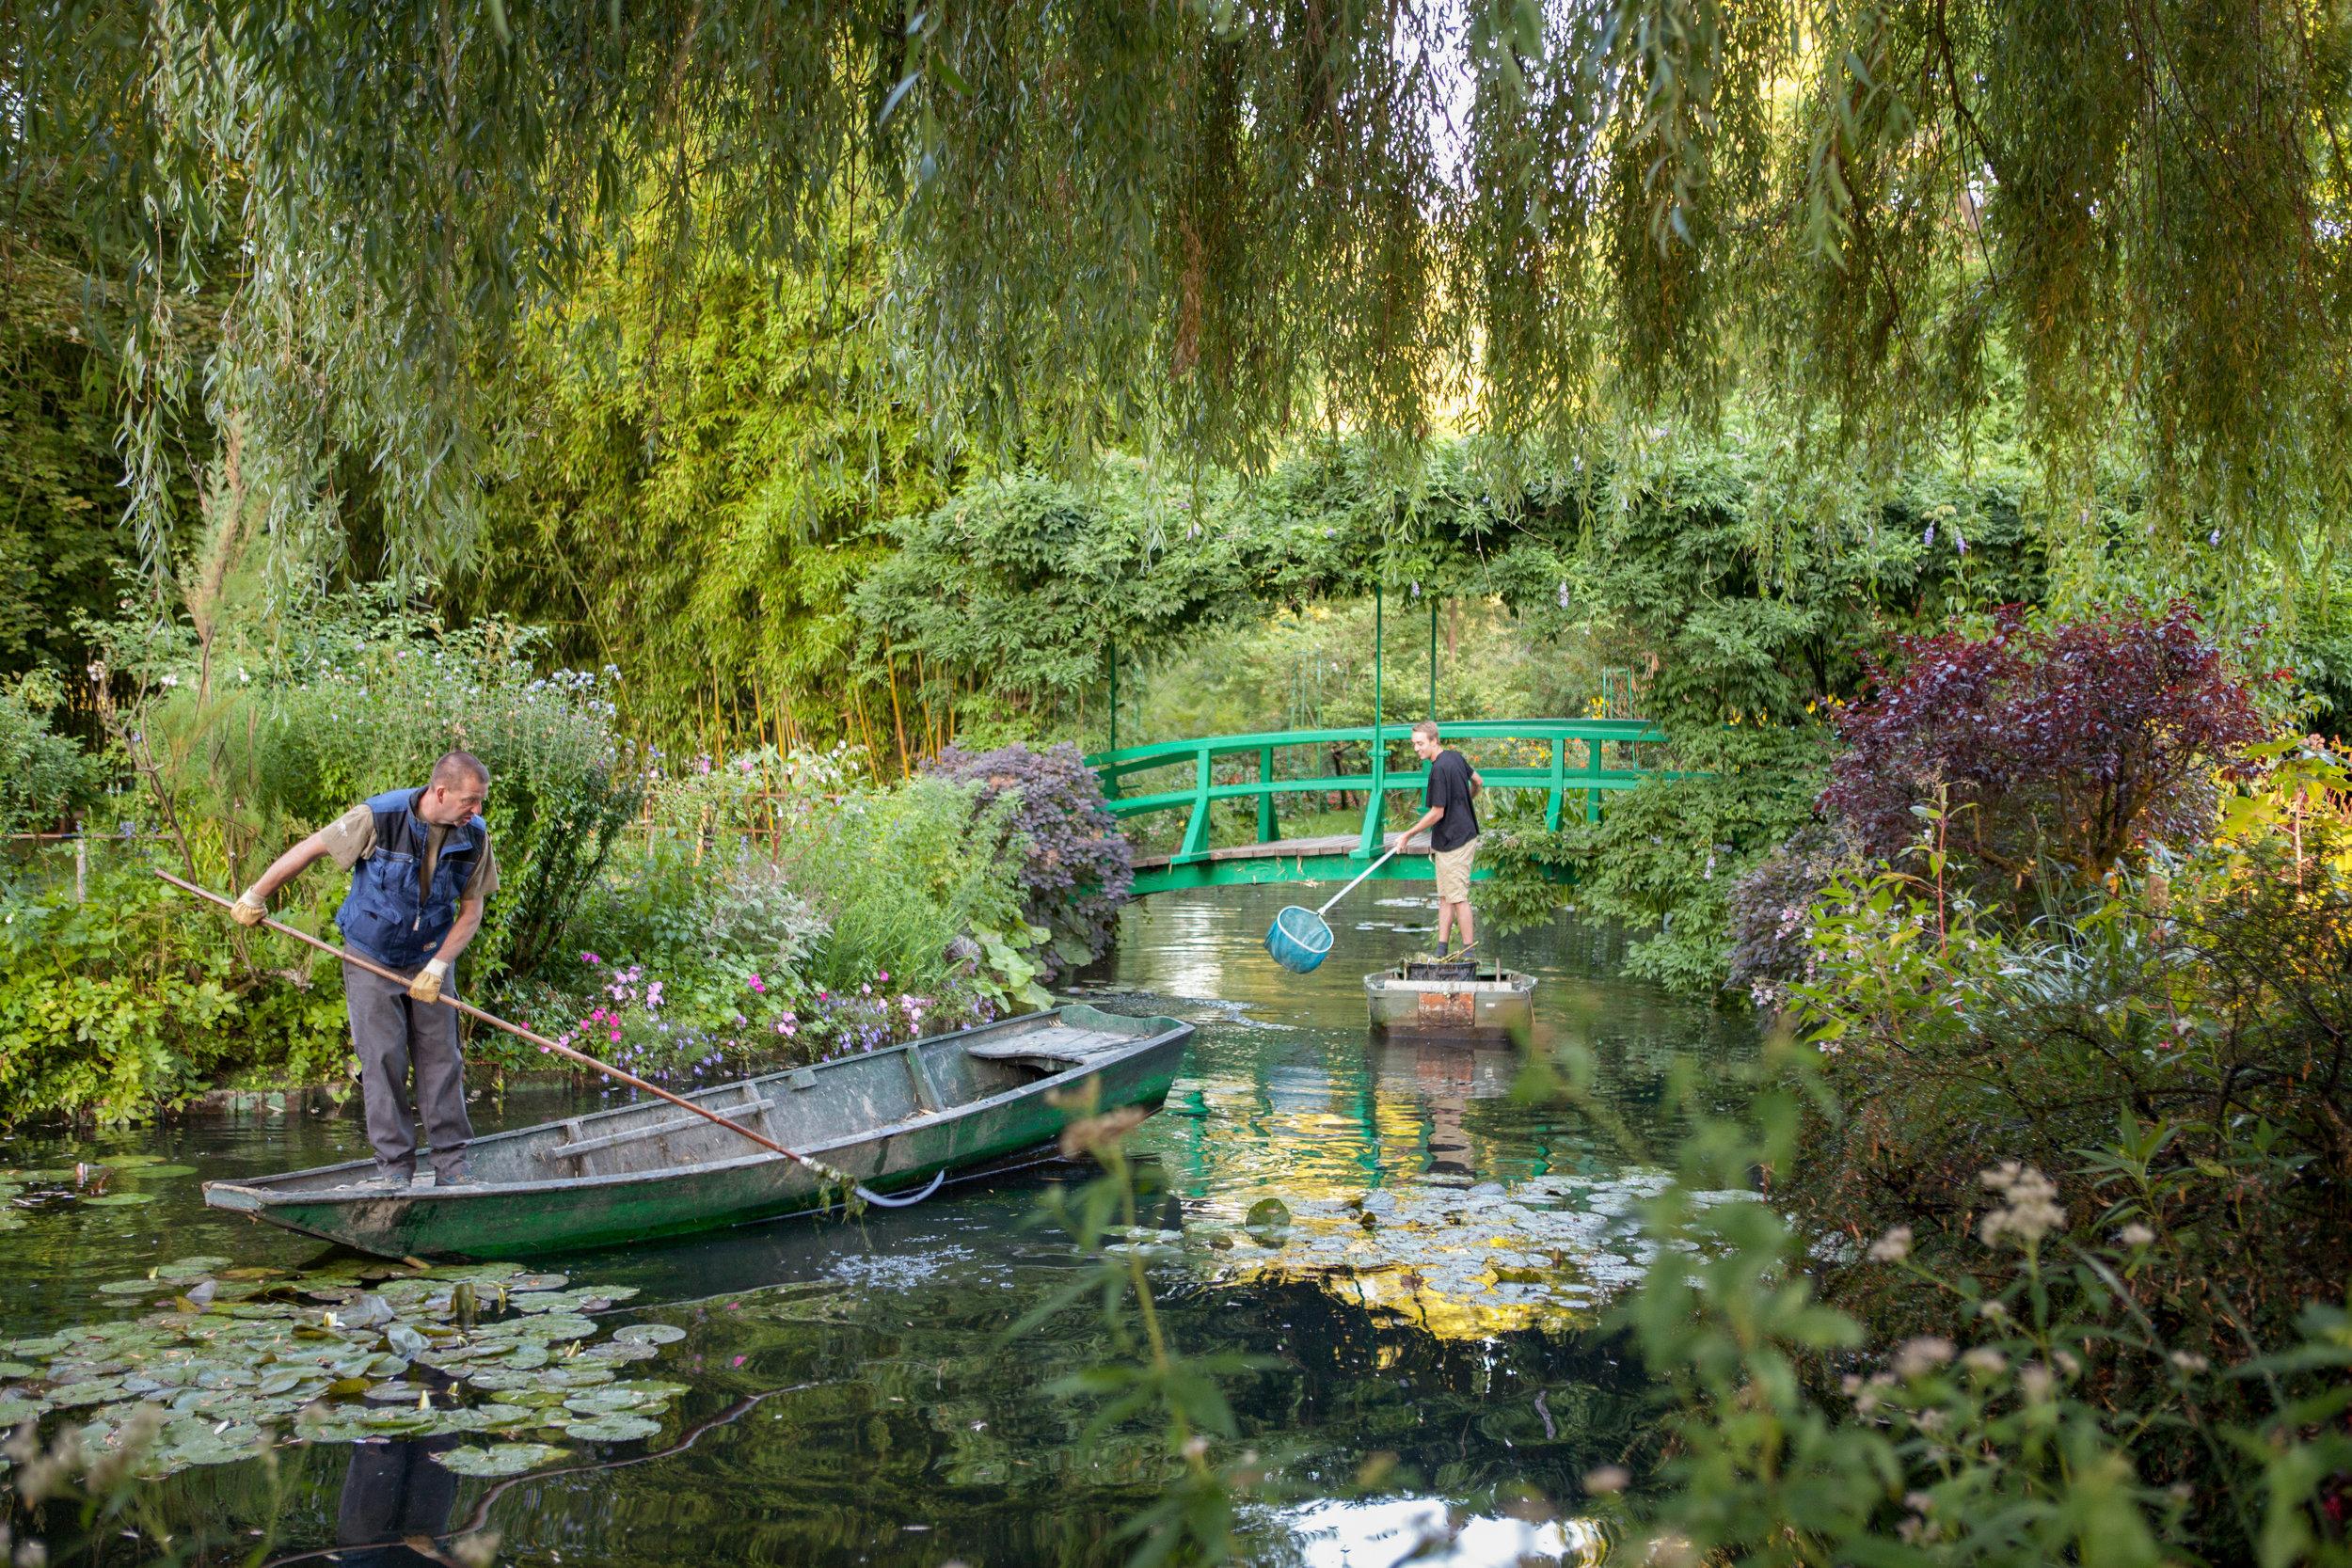 20120829-Giverny Garden-9.jpg